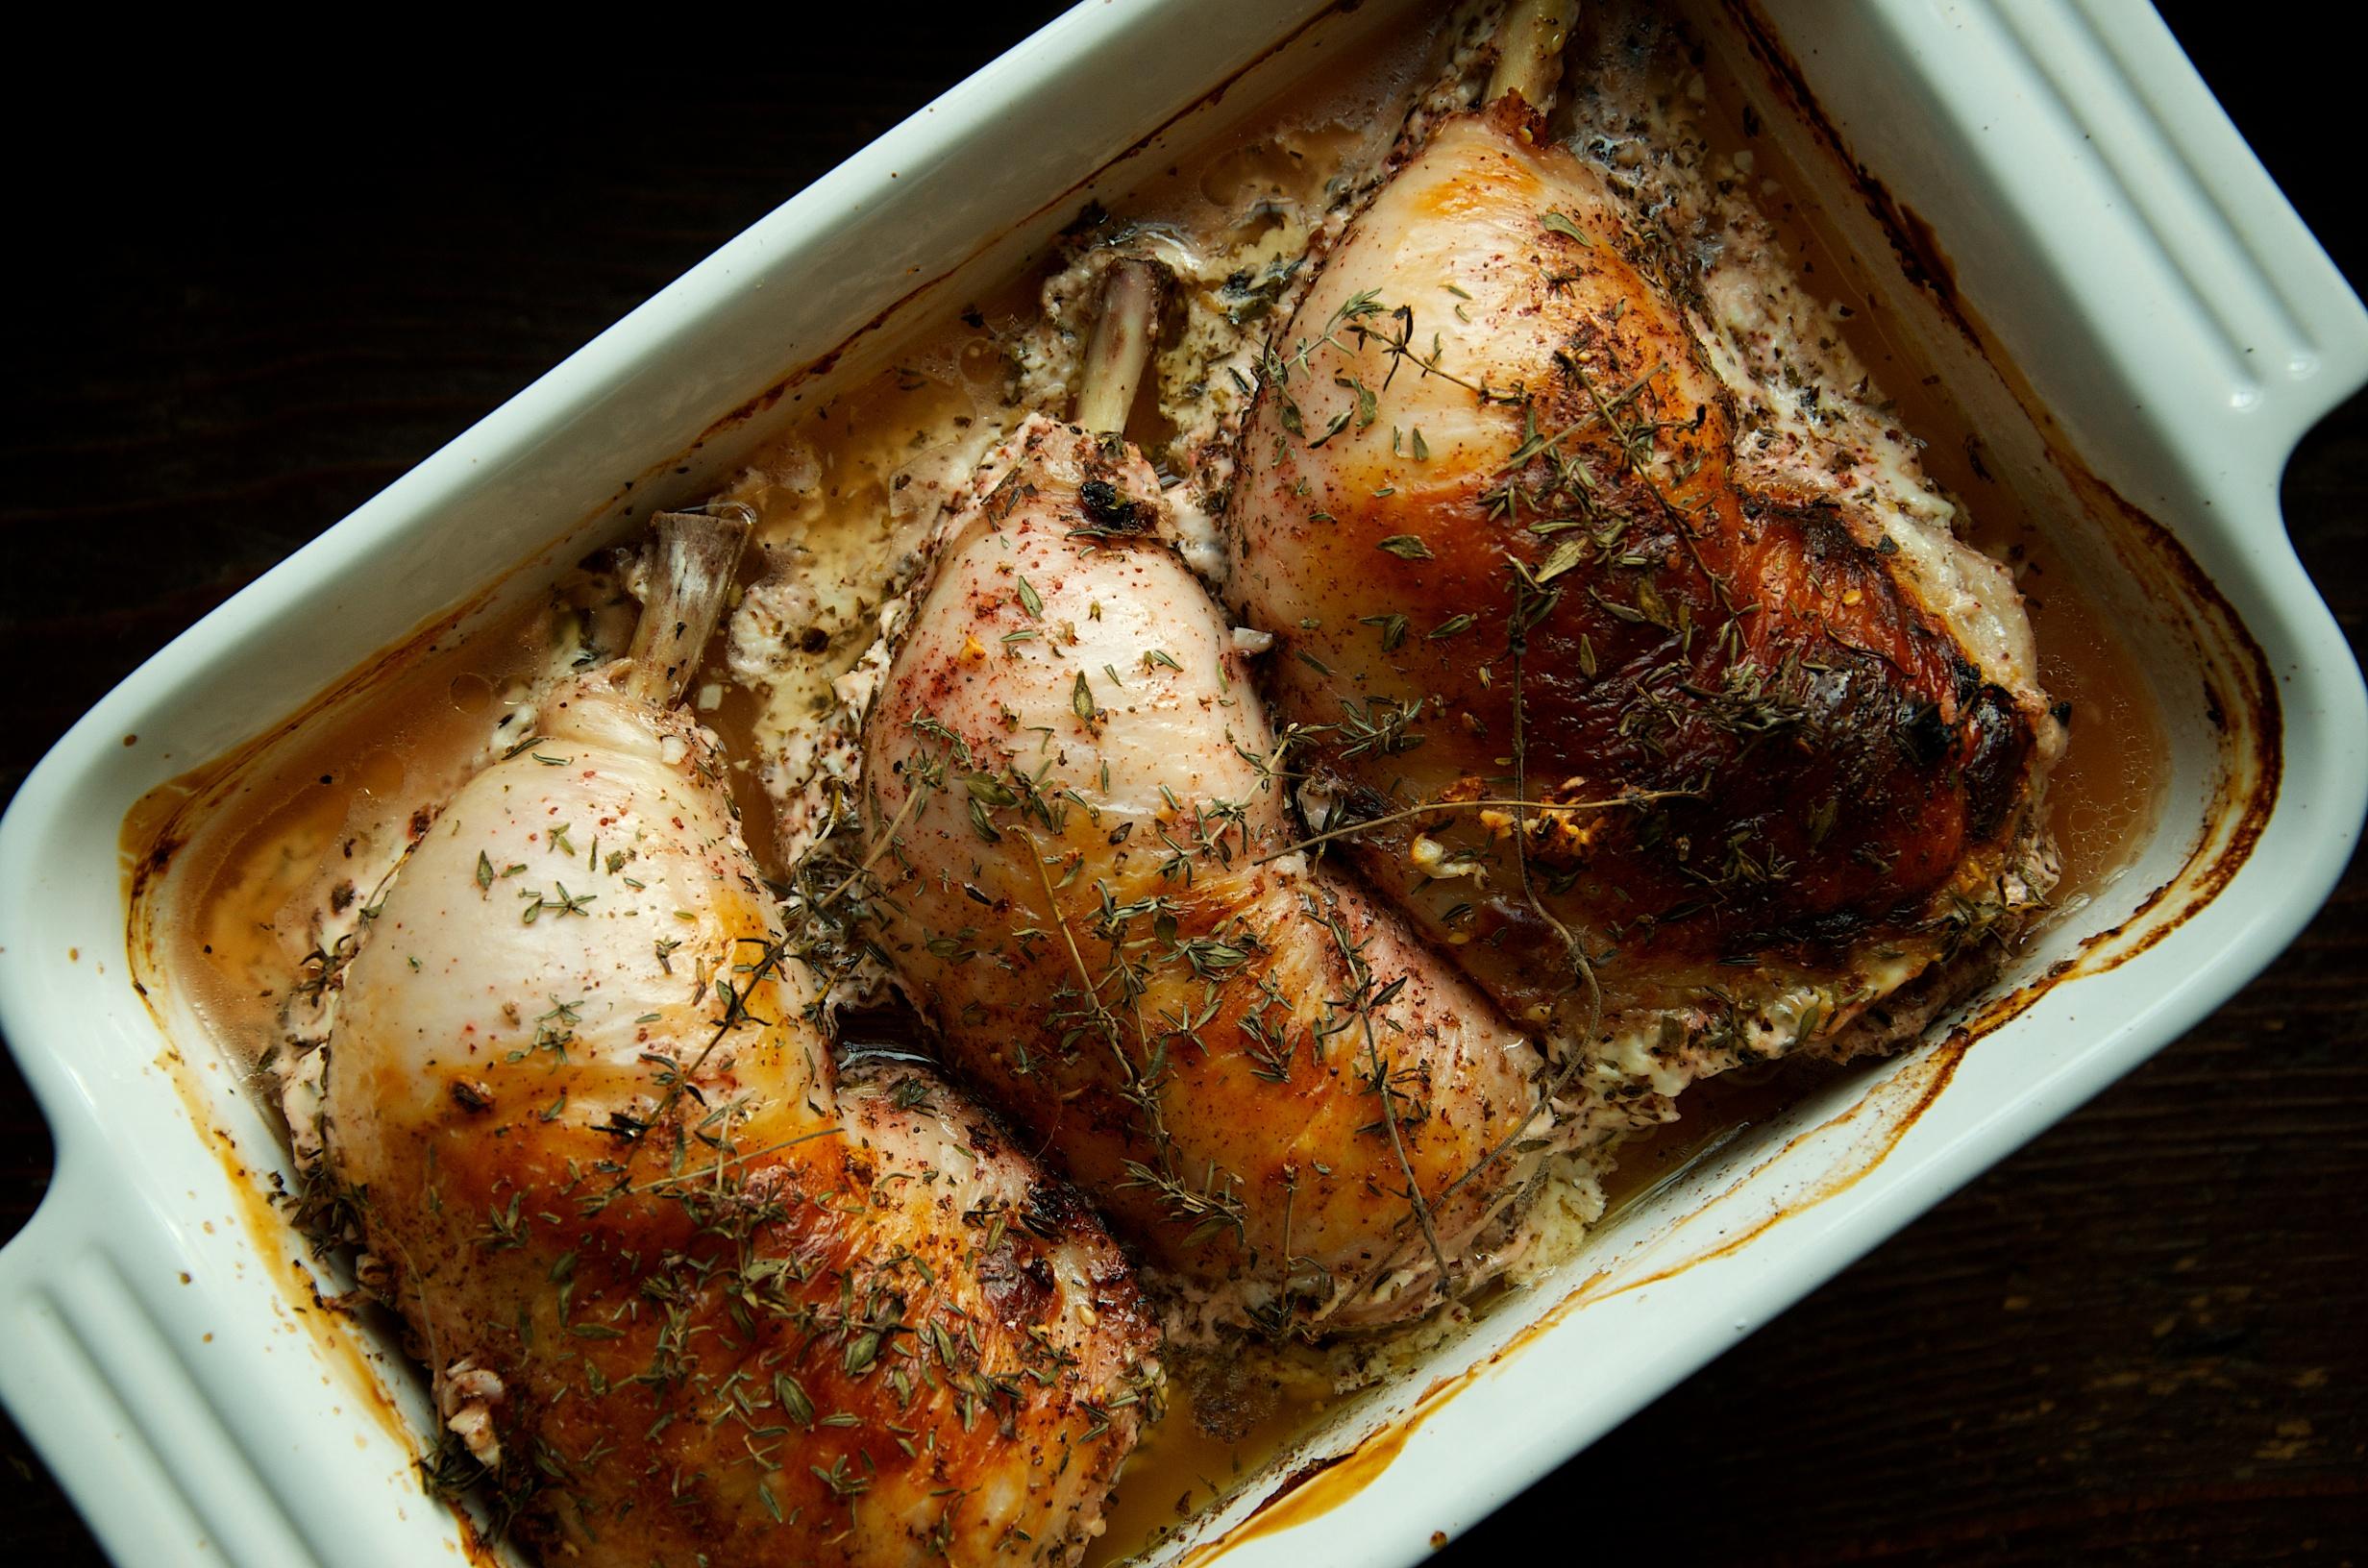 Oven Braised Buttermilk Chicken with Za'atar